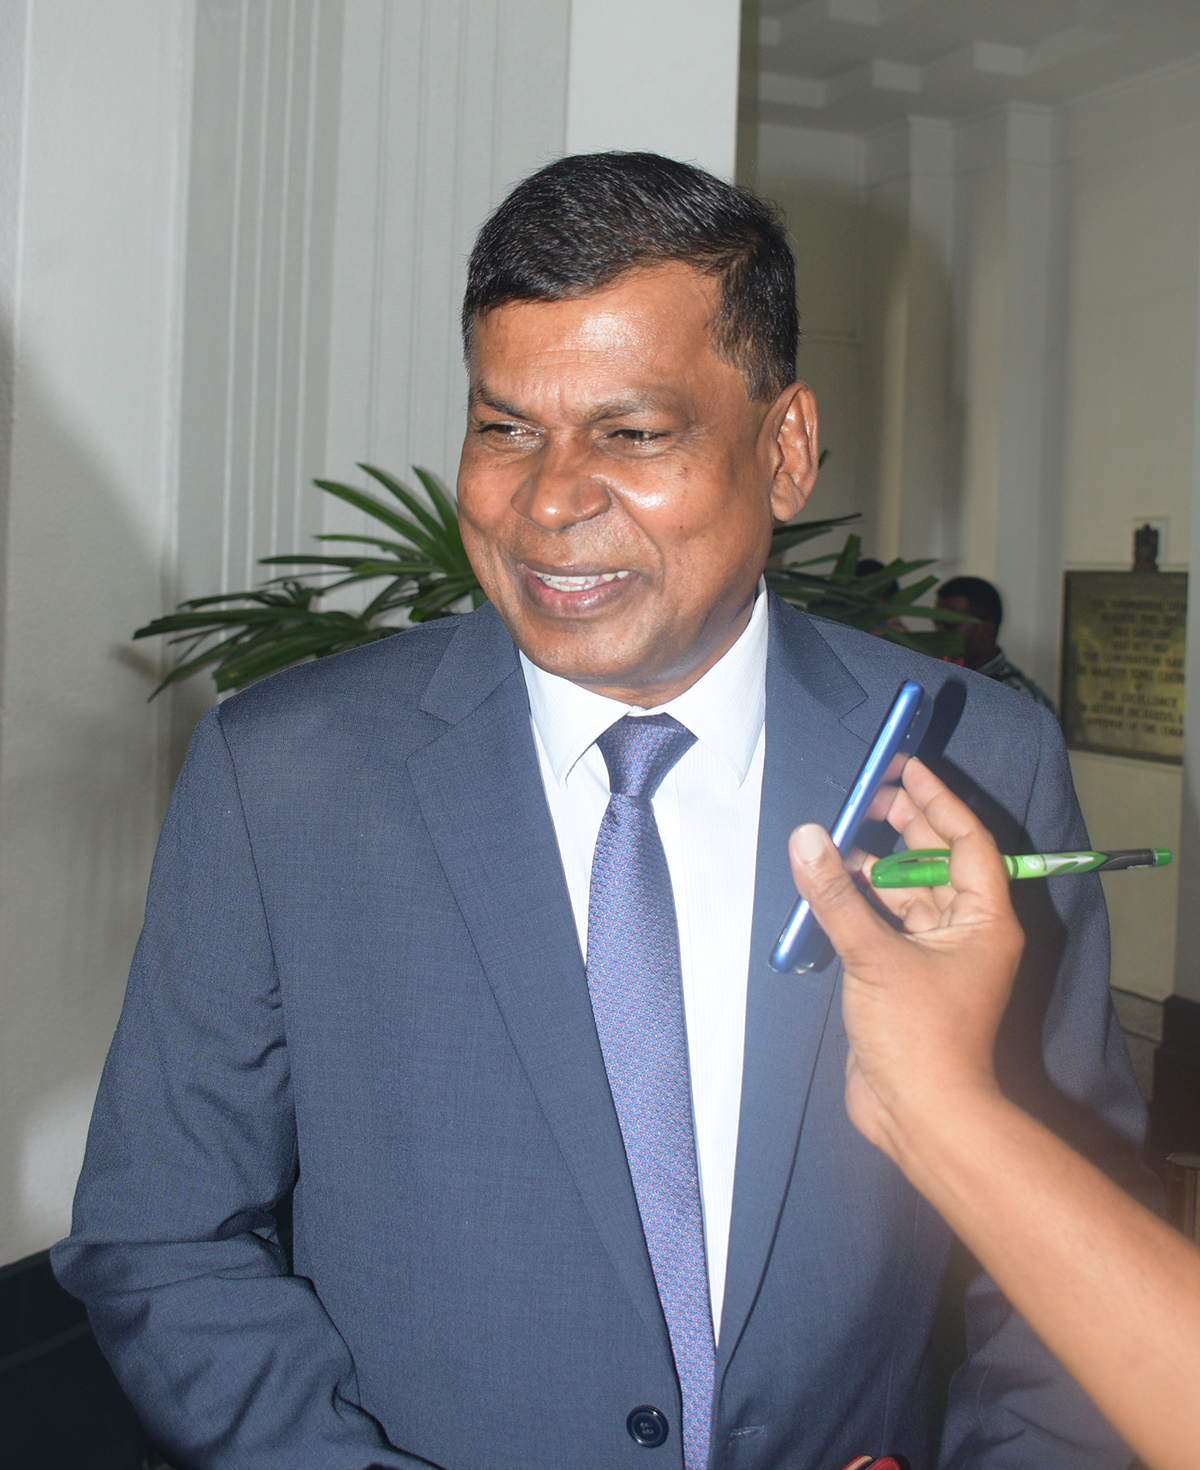 Opposition member Dr, Biman Prasad on February 11,2019.Photo:Simione Haravanua.